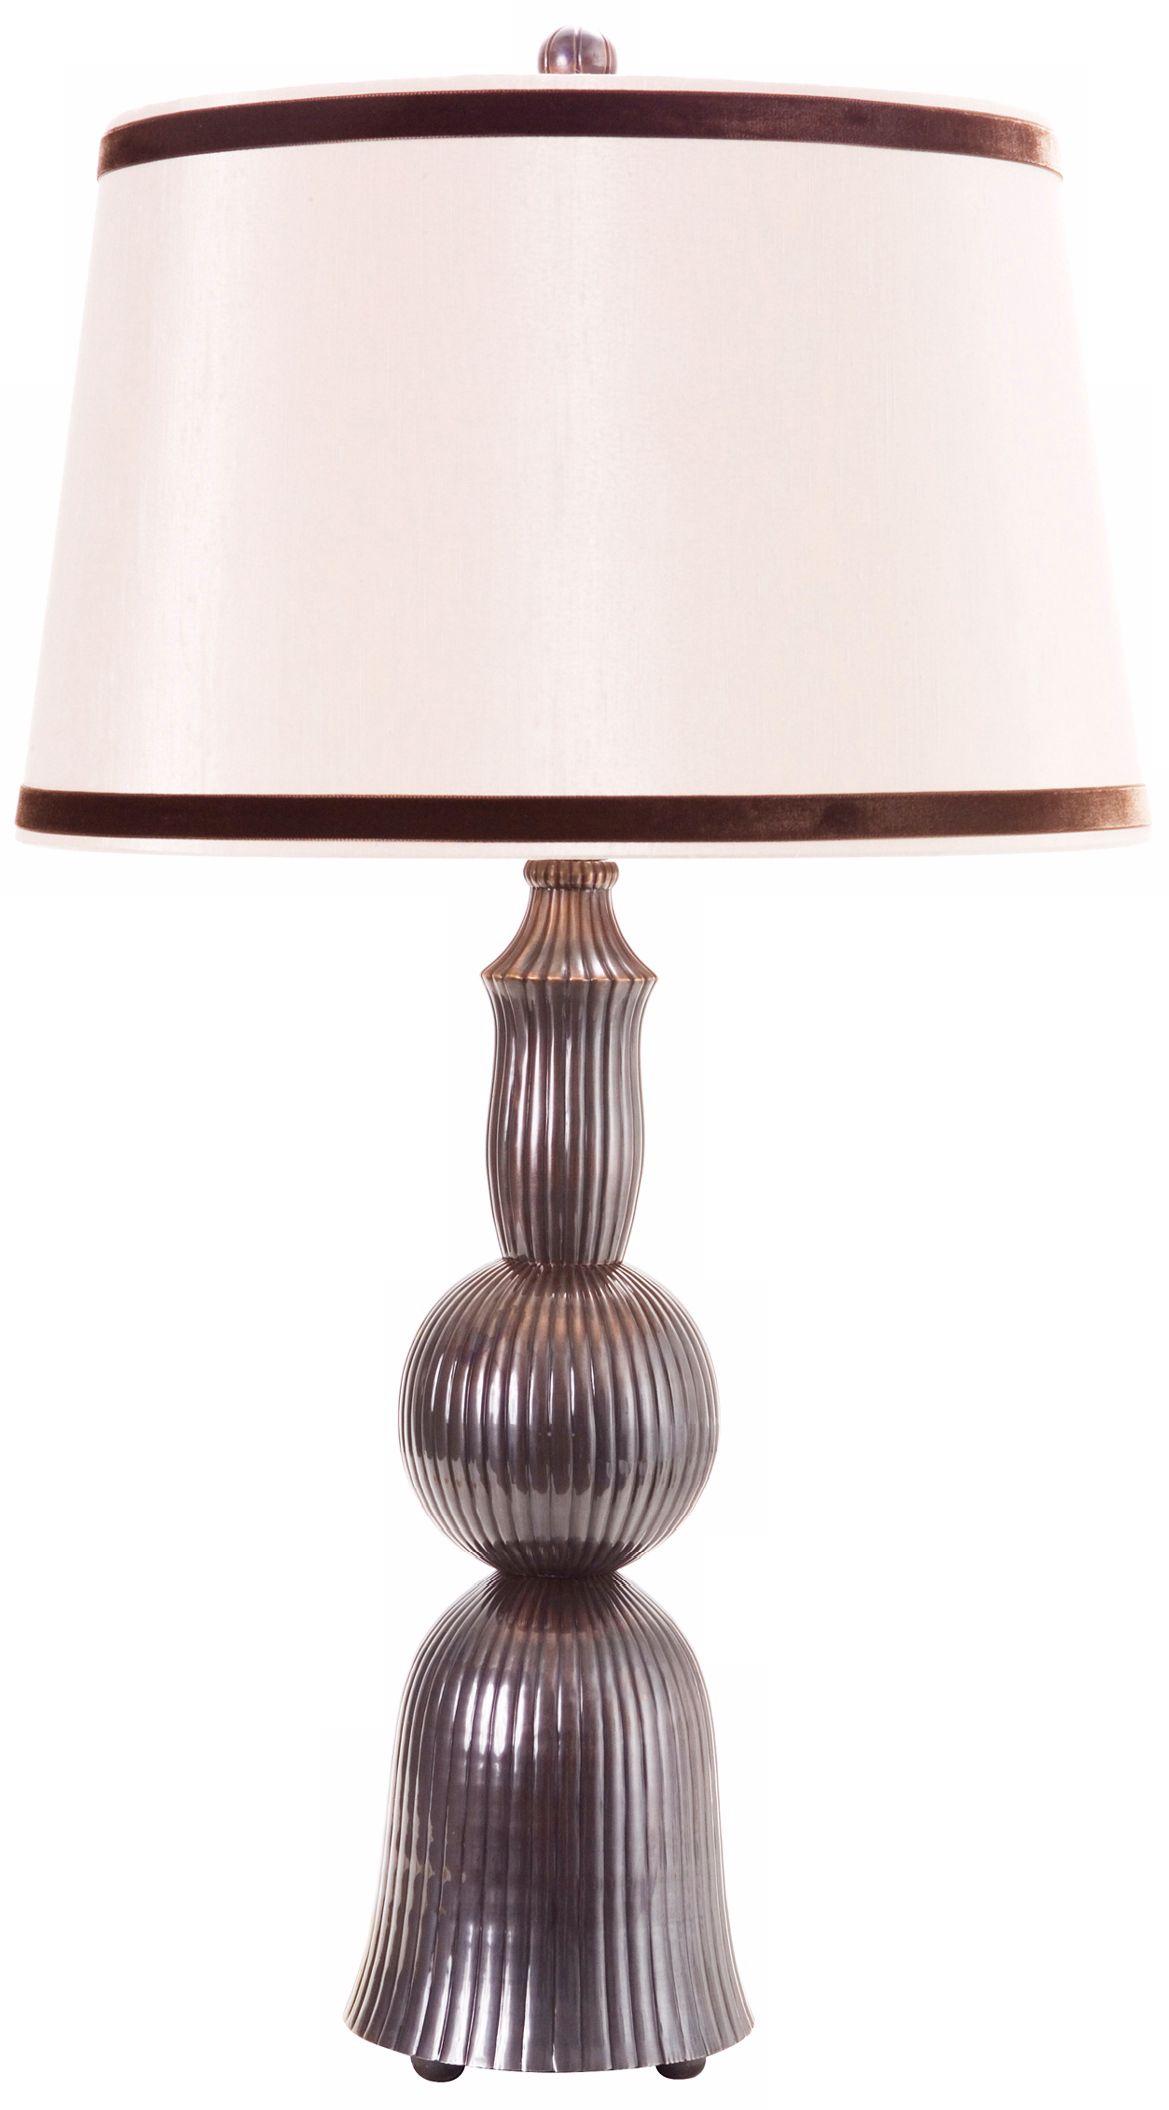 Frederick Cooper Mullholland Drive II Table Lamp